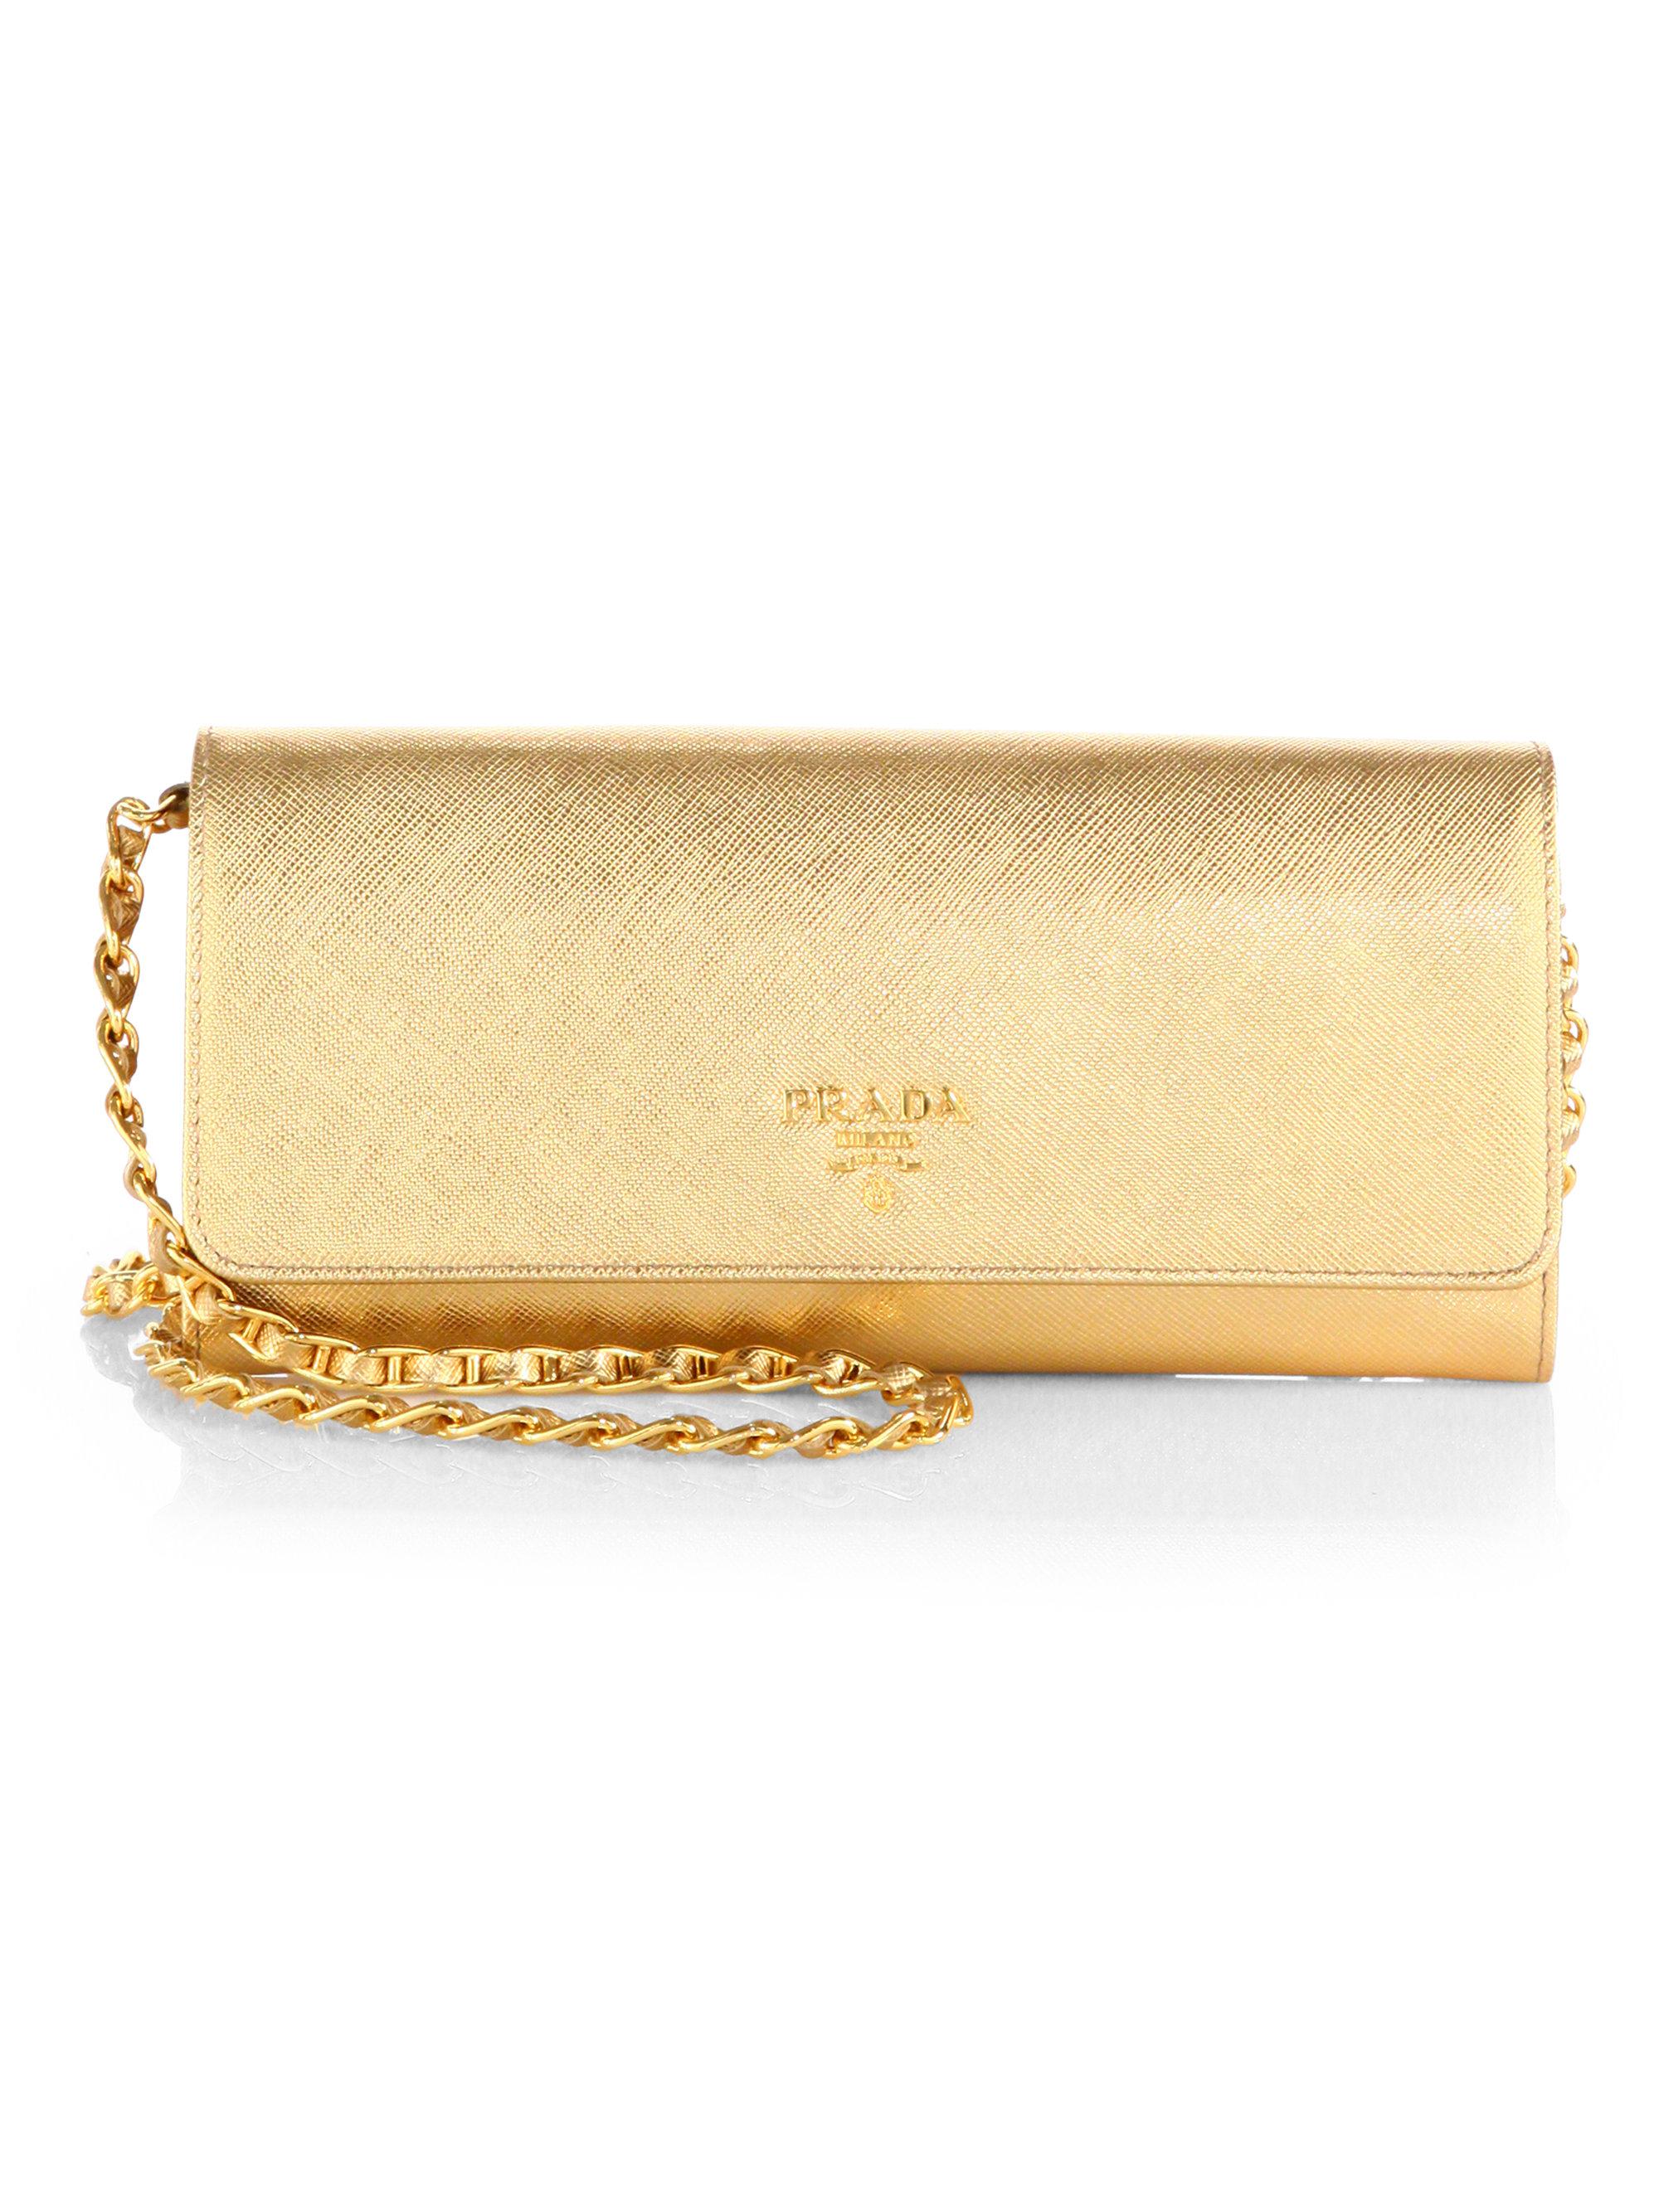 Prada Saffiano Metal Oro Chain Wallet in Gold (PLATINO-GOLD) | Lyst